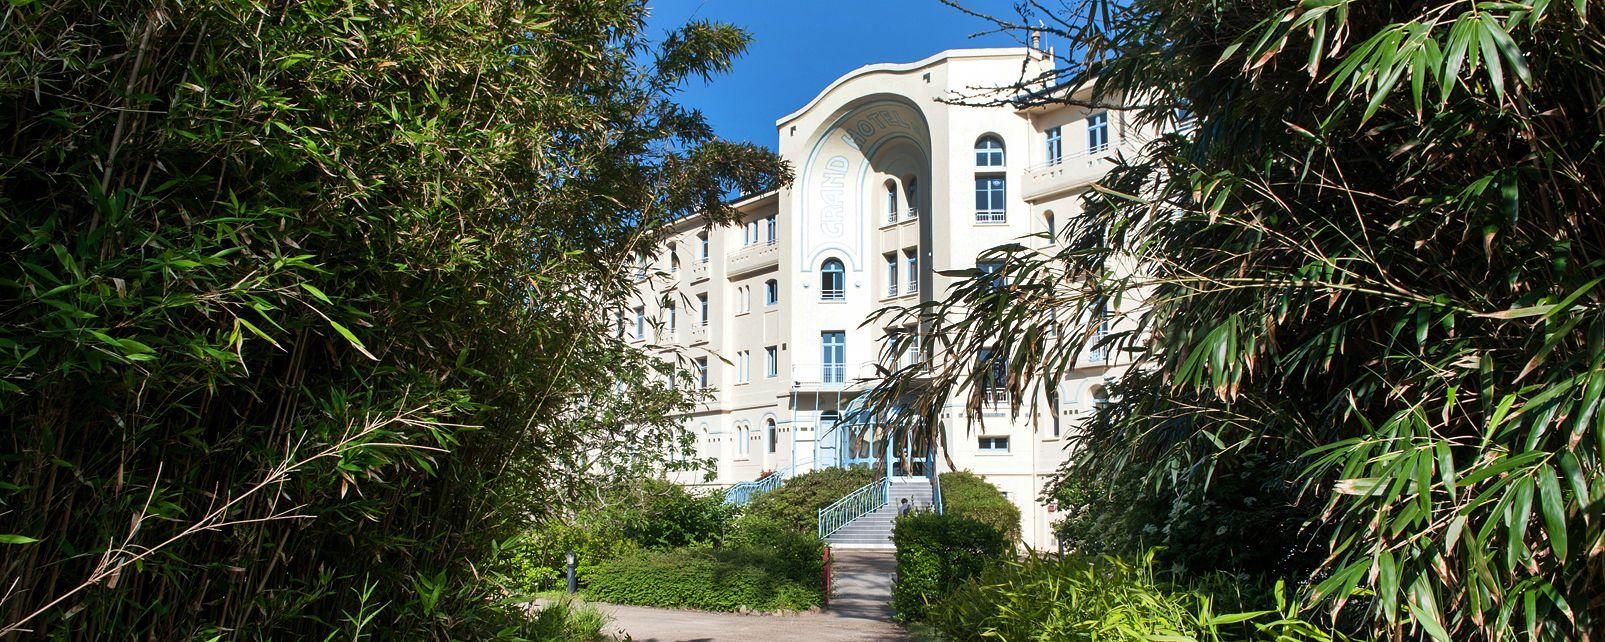 Club Belambra Le Grand Hotel de la Mer